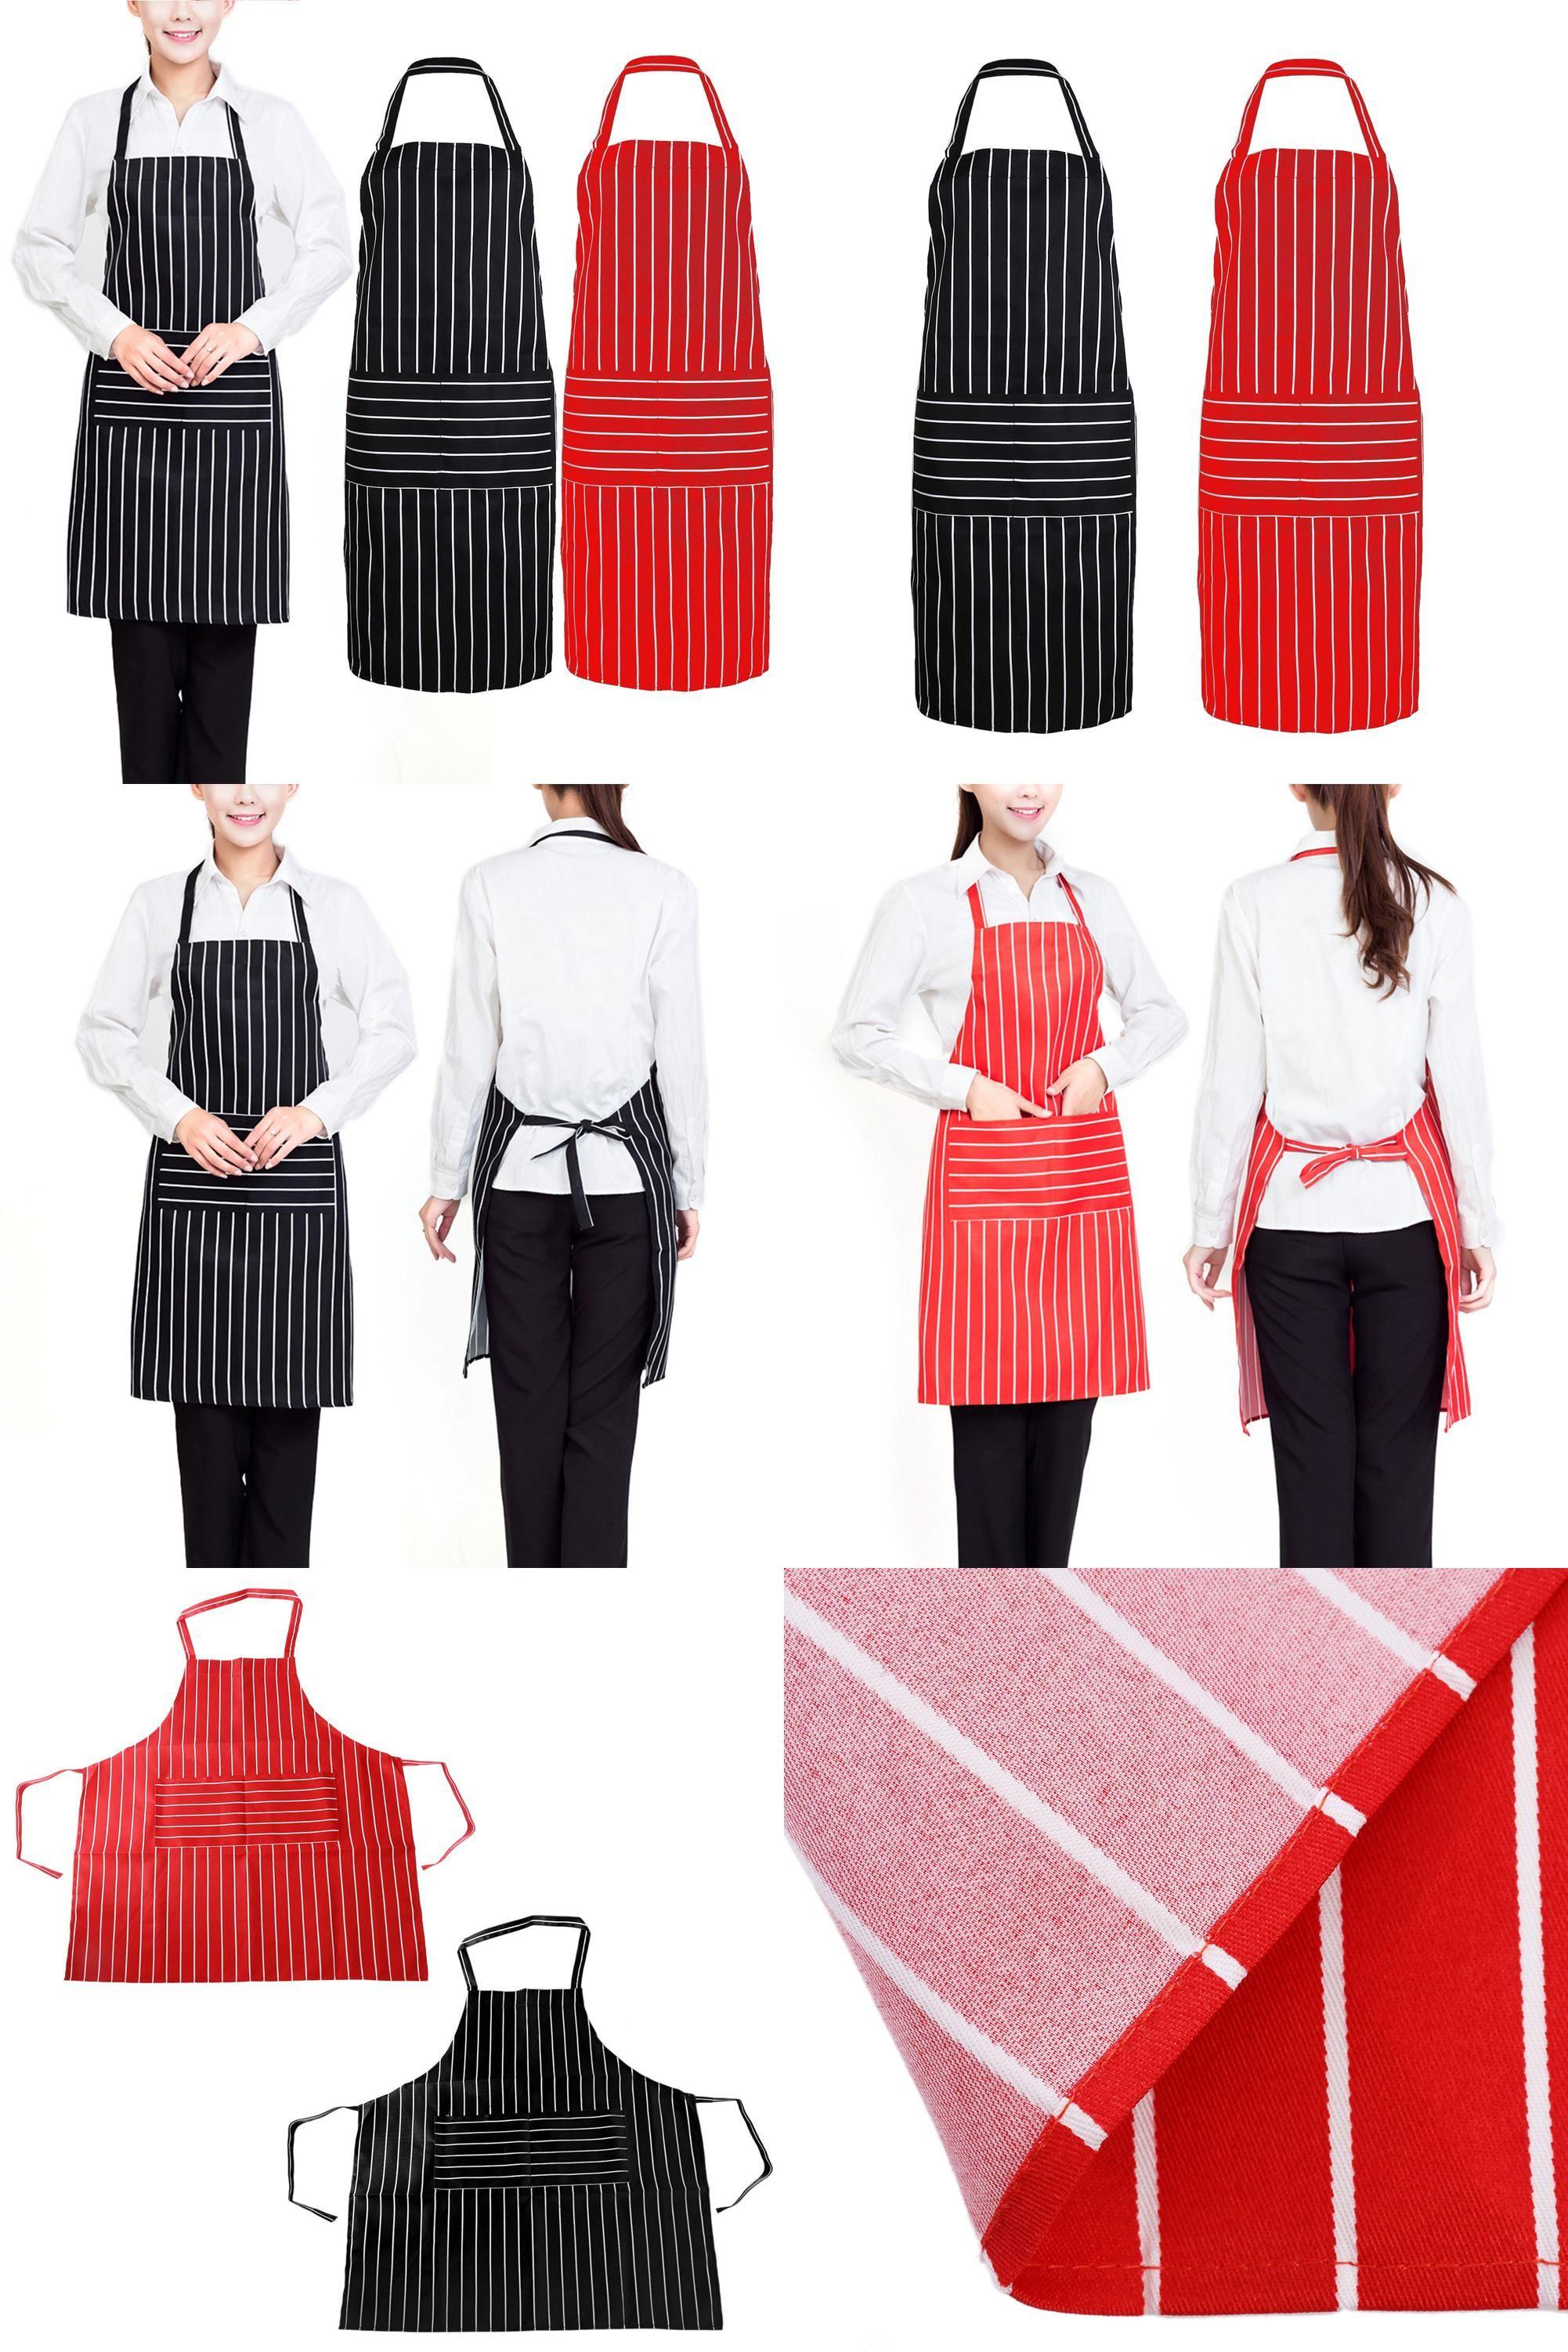 [Visit to Buy] Plain Stripe Creative Stripe Kitchen Apron for Women Men Useful Cooking Apron Grid Adjustable Chef apron Cloth Accessories #Advertisement